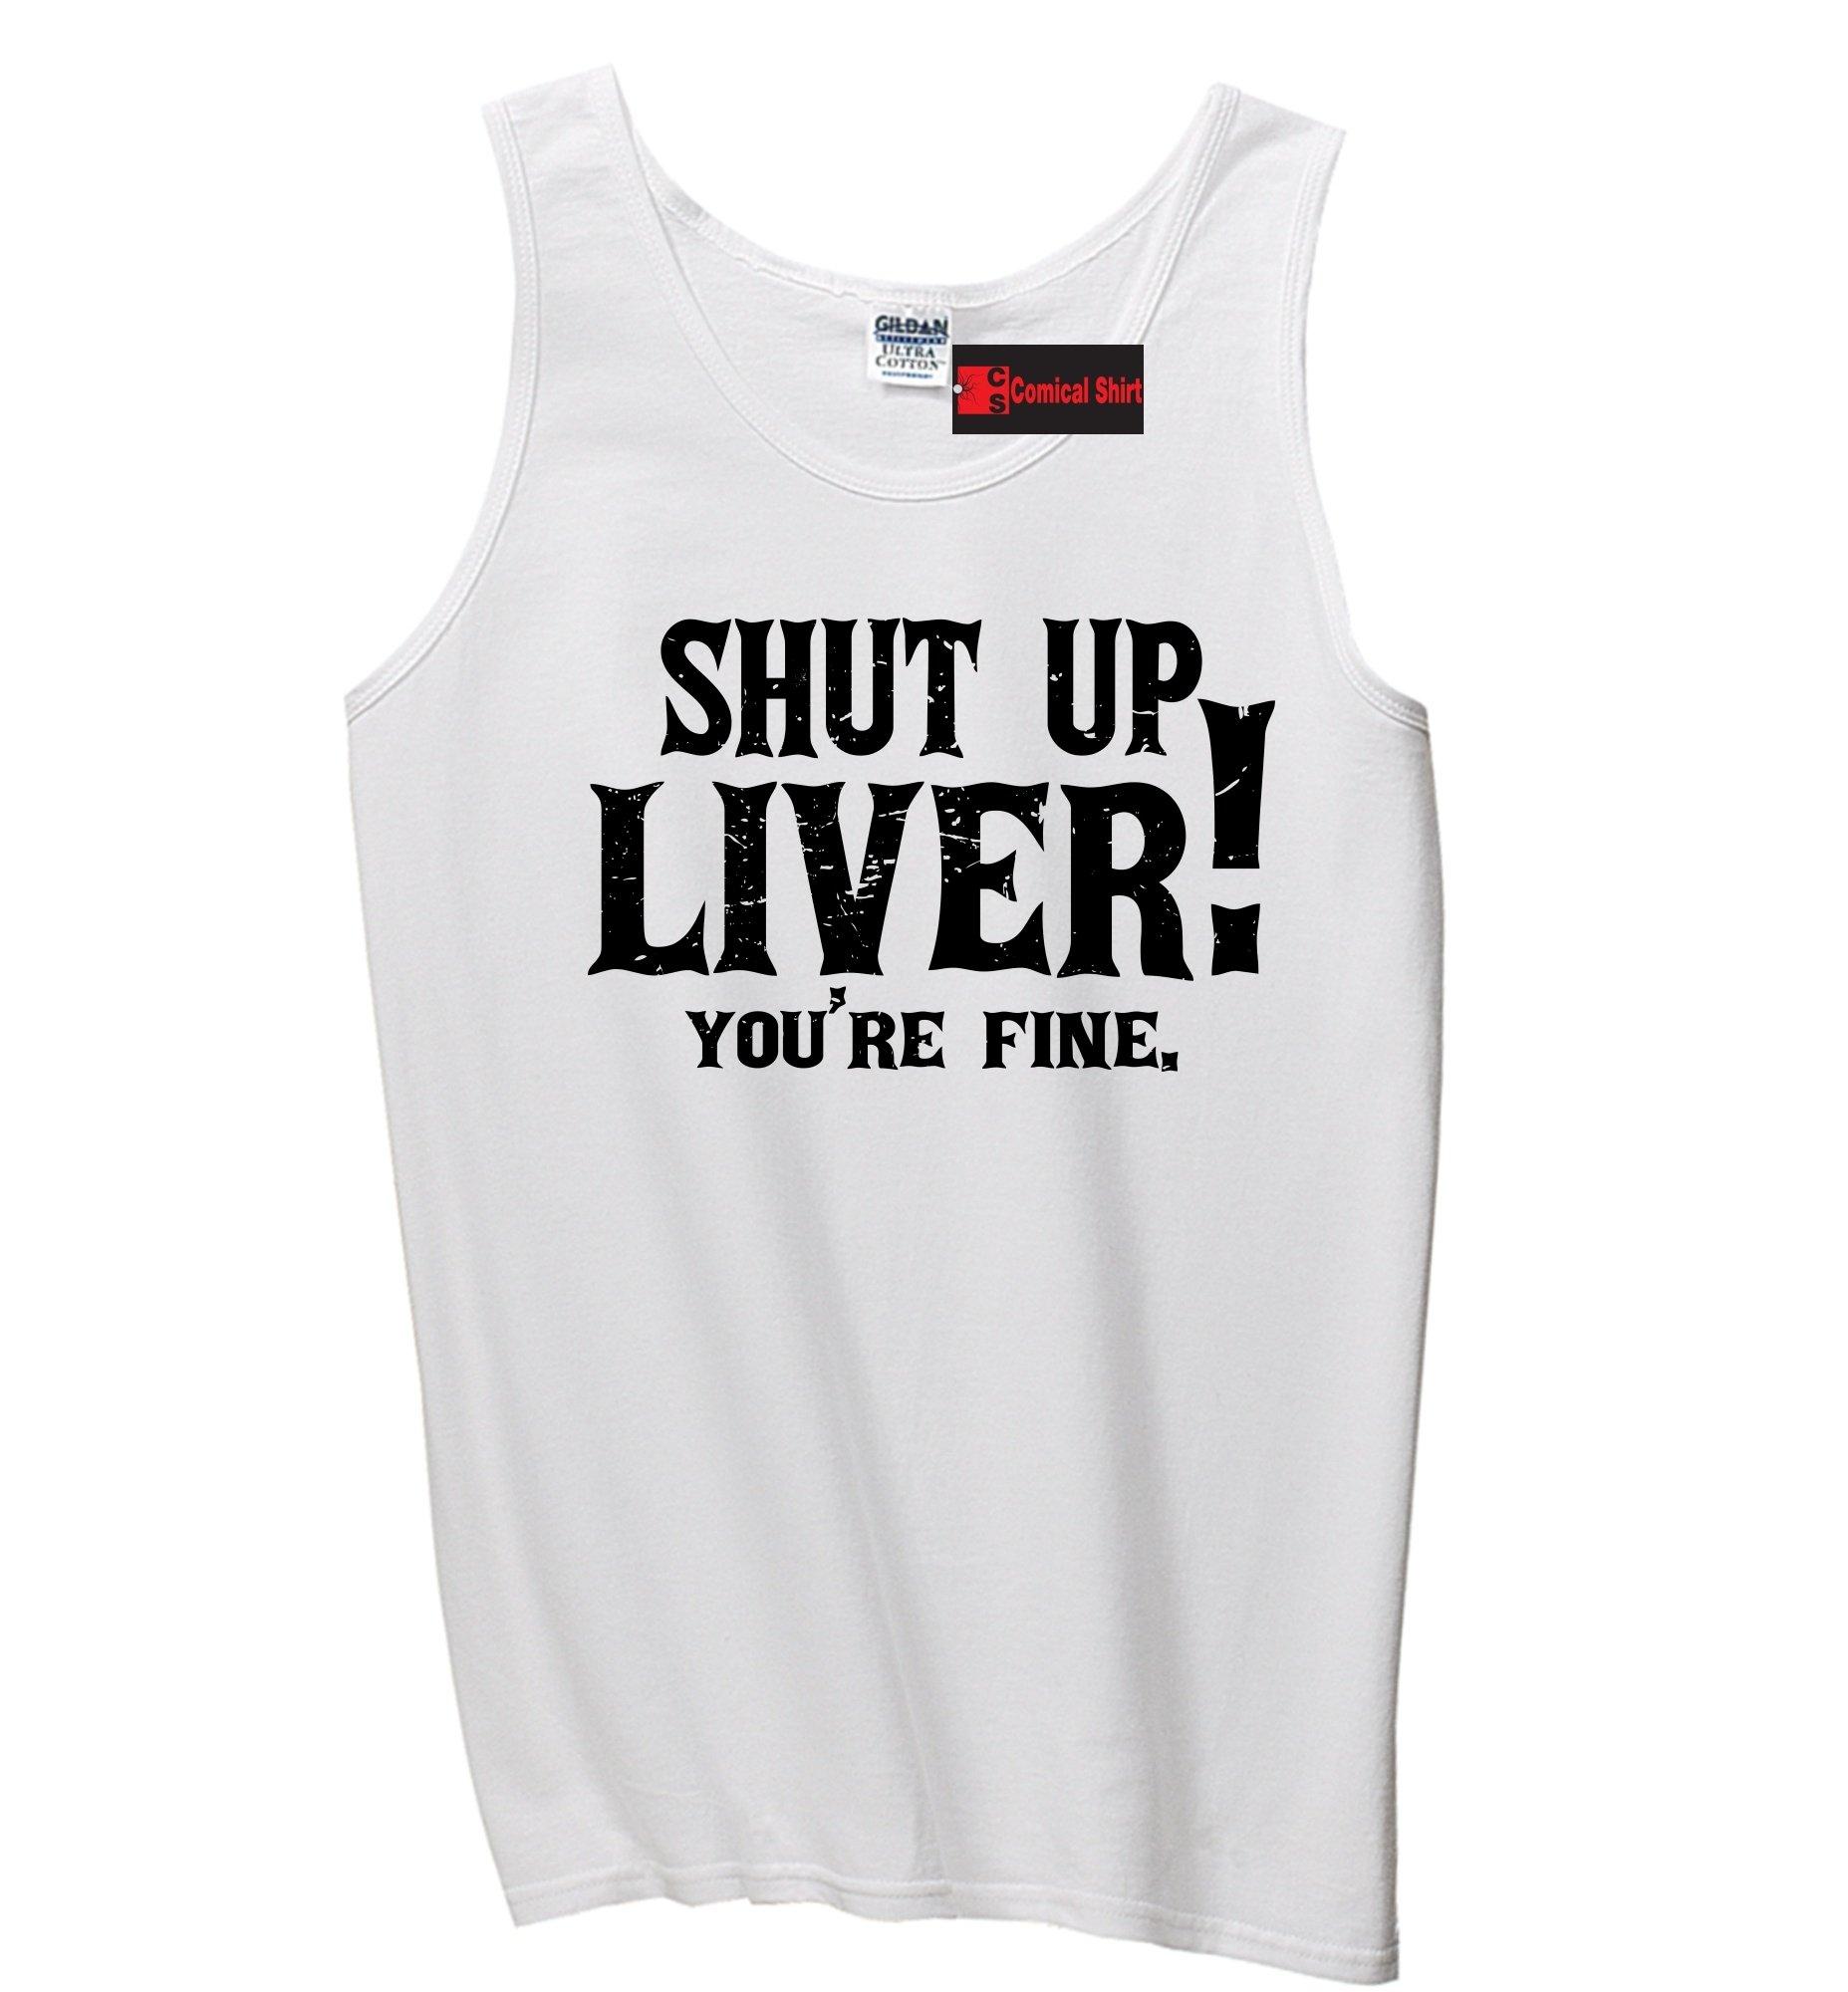 Comical Shirt Men's Shut up Liver You're Fine White L